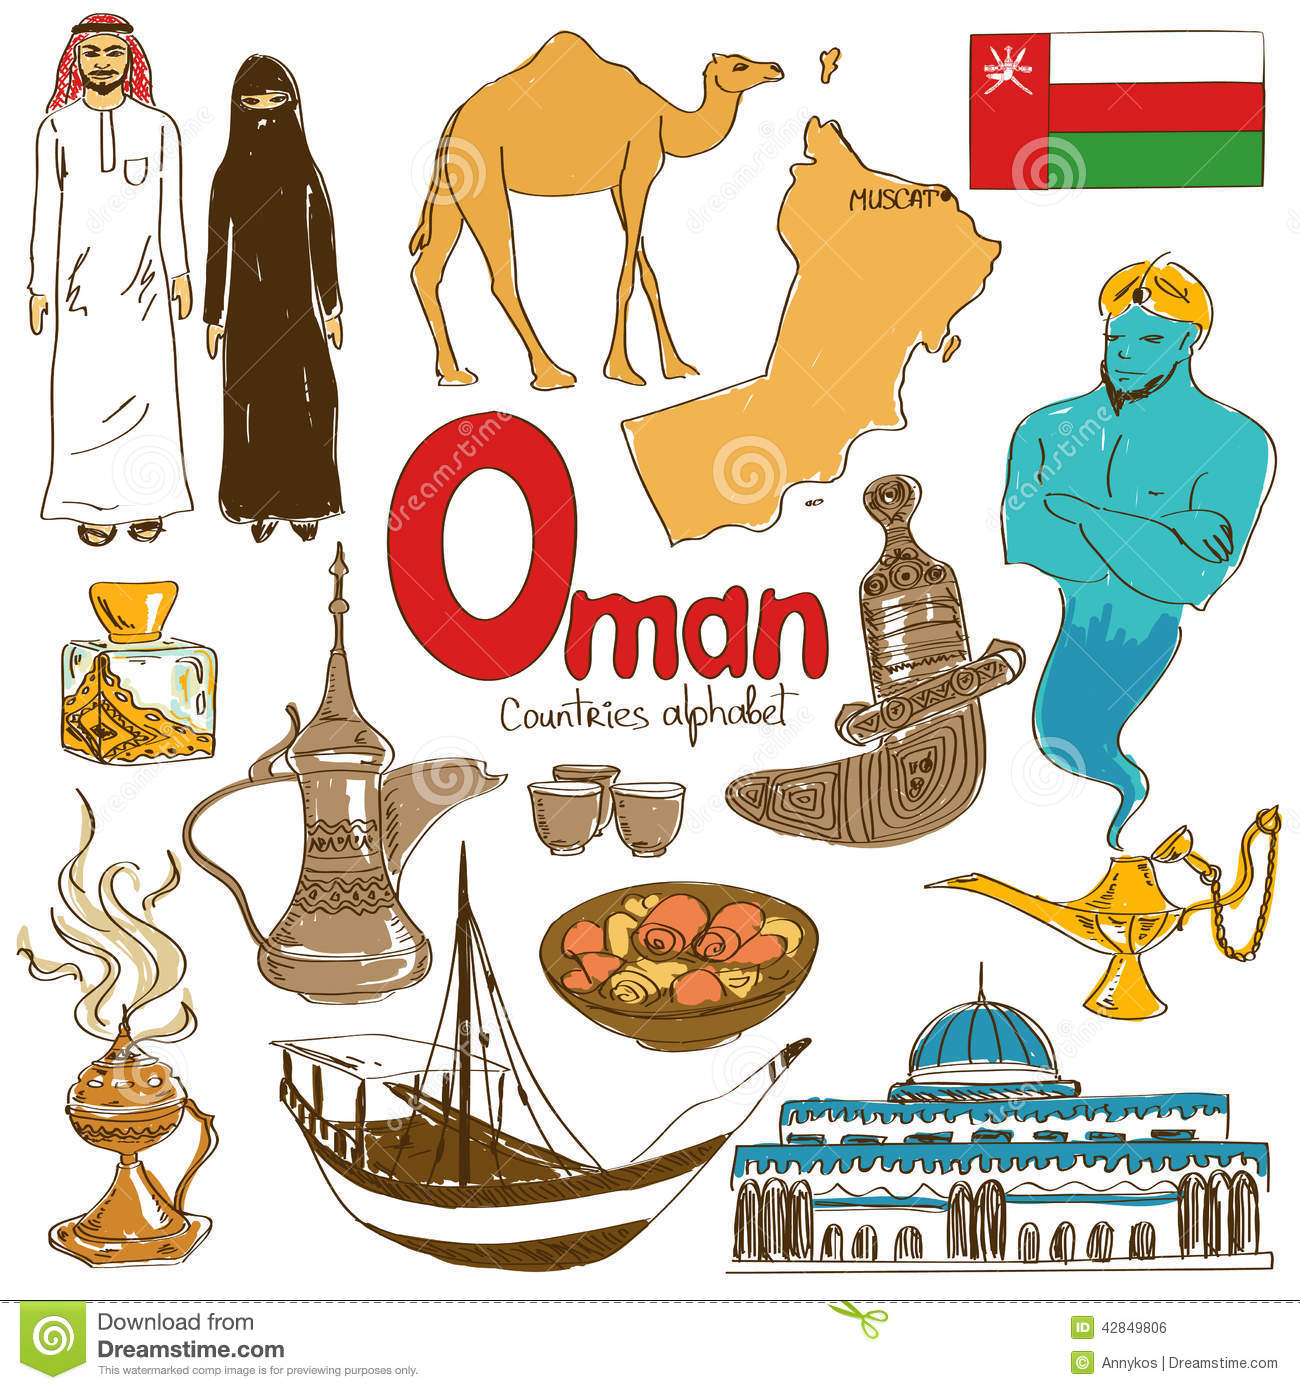 Oman clipart.